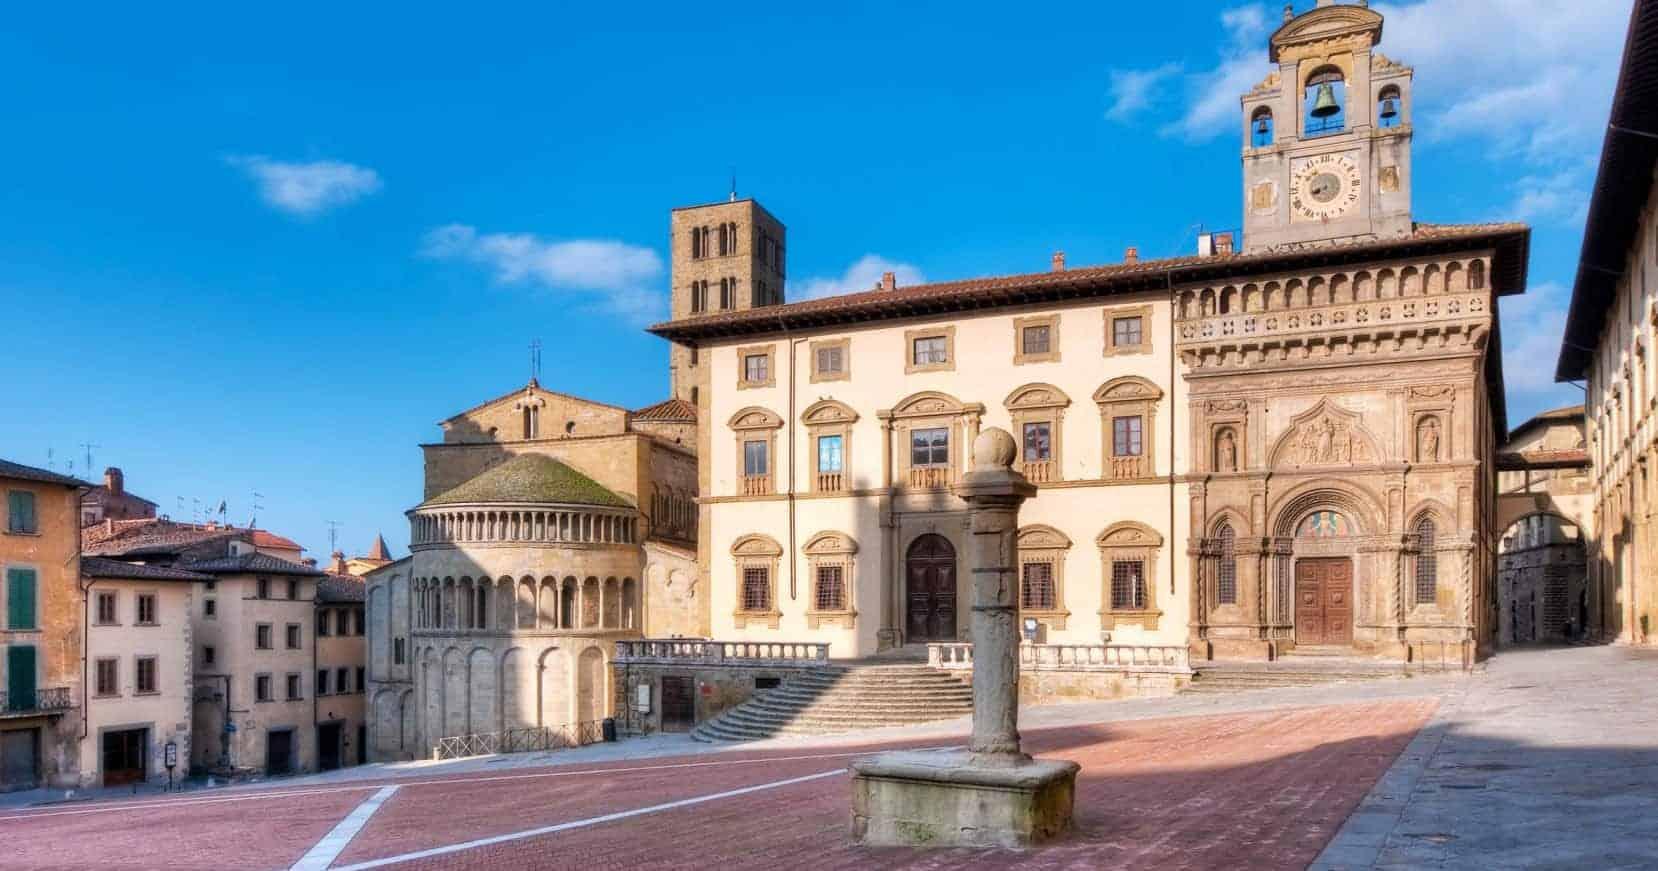 Arezzo reisdit.no